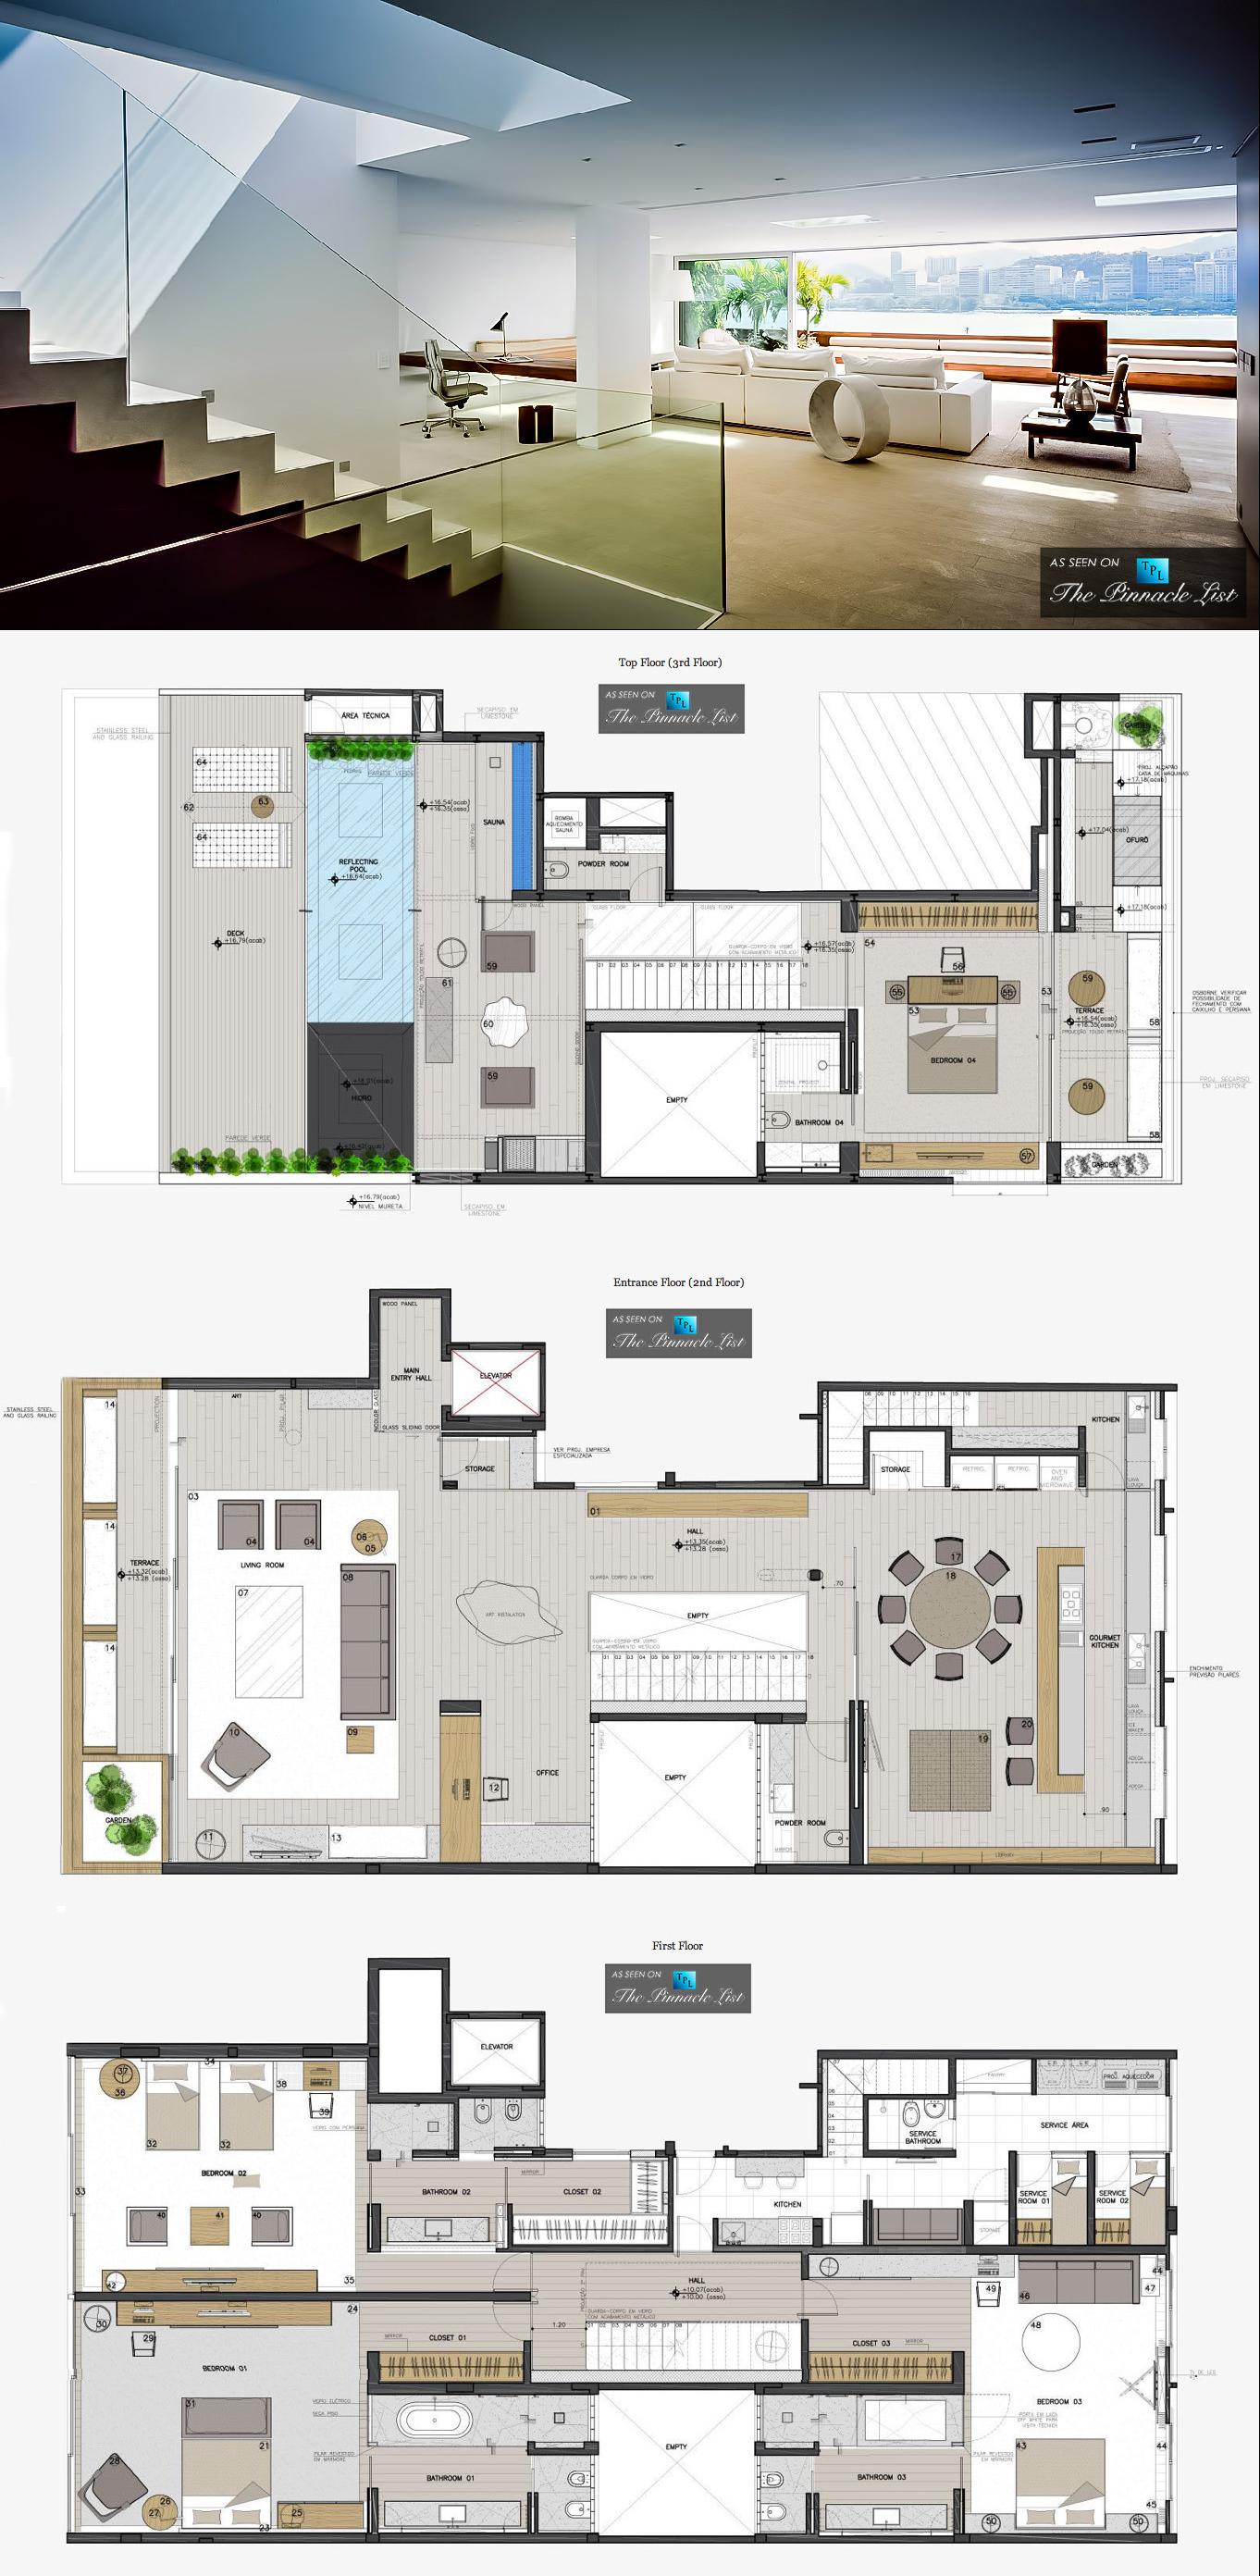 Miraculous Casa Urca Penthouse Rio De Janeiro Brazil Showcase Beutiful Home Inspiration Ommitmahrainfo